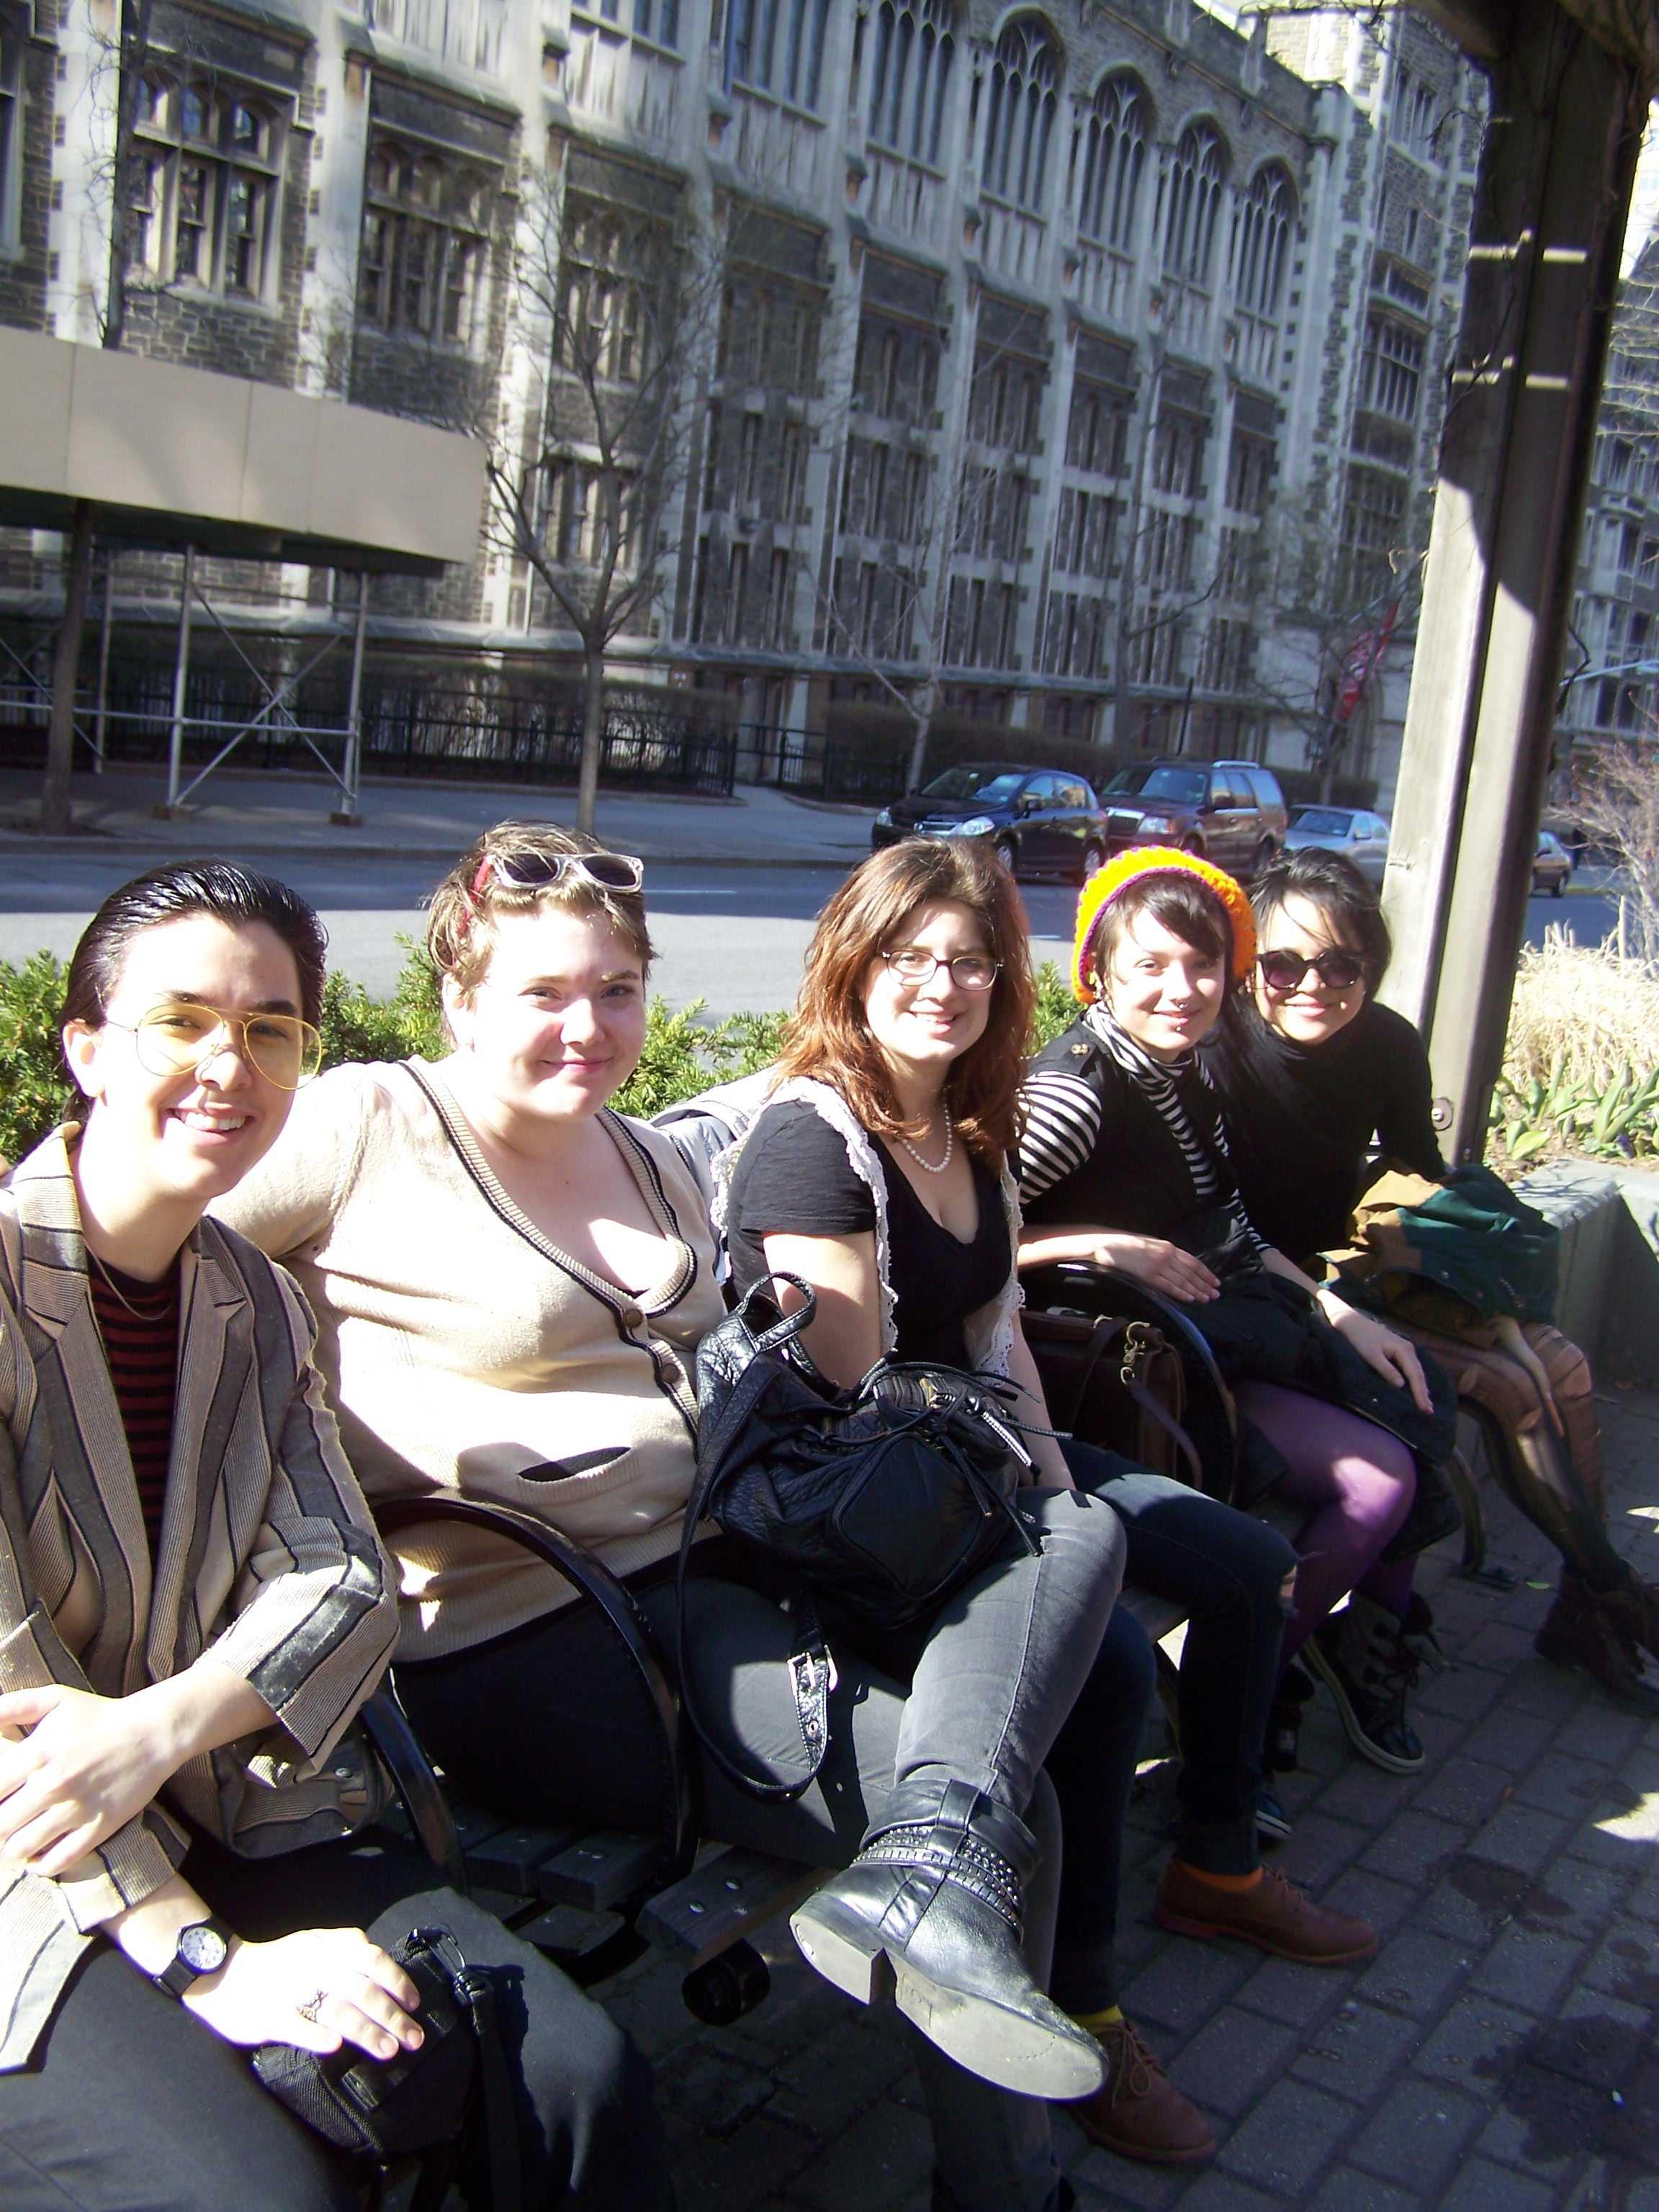 Niko Martell '13, Anna Binkovitz '14, Abbie Shain '14,  Renee Schminkey '16 and Rachel Rostad '15 at CUPSI. Photo courtesy of Niko Martell.